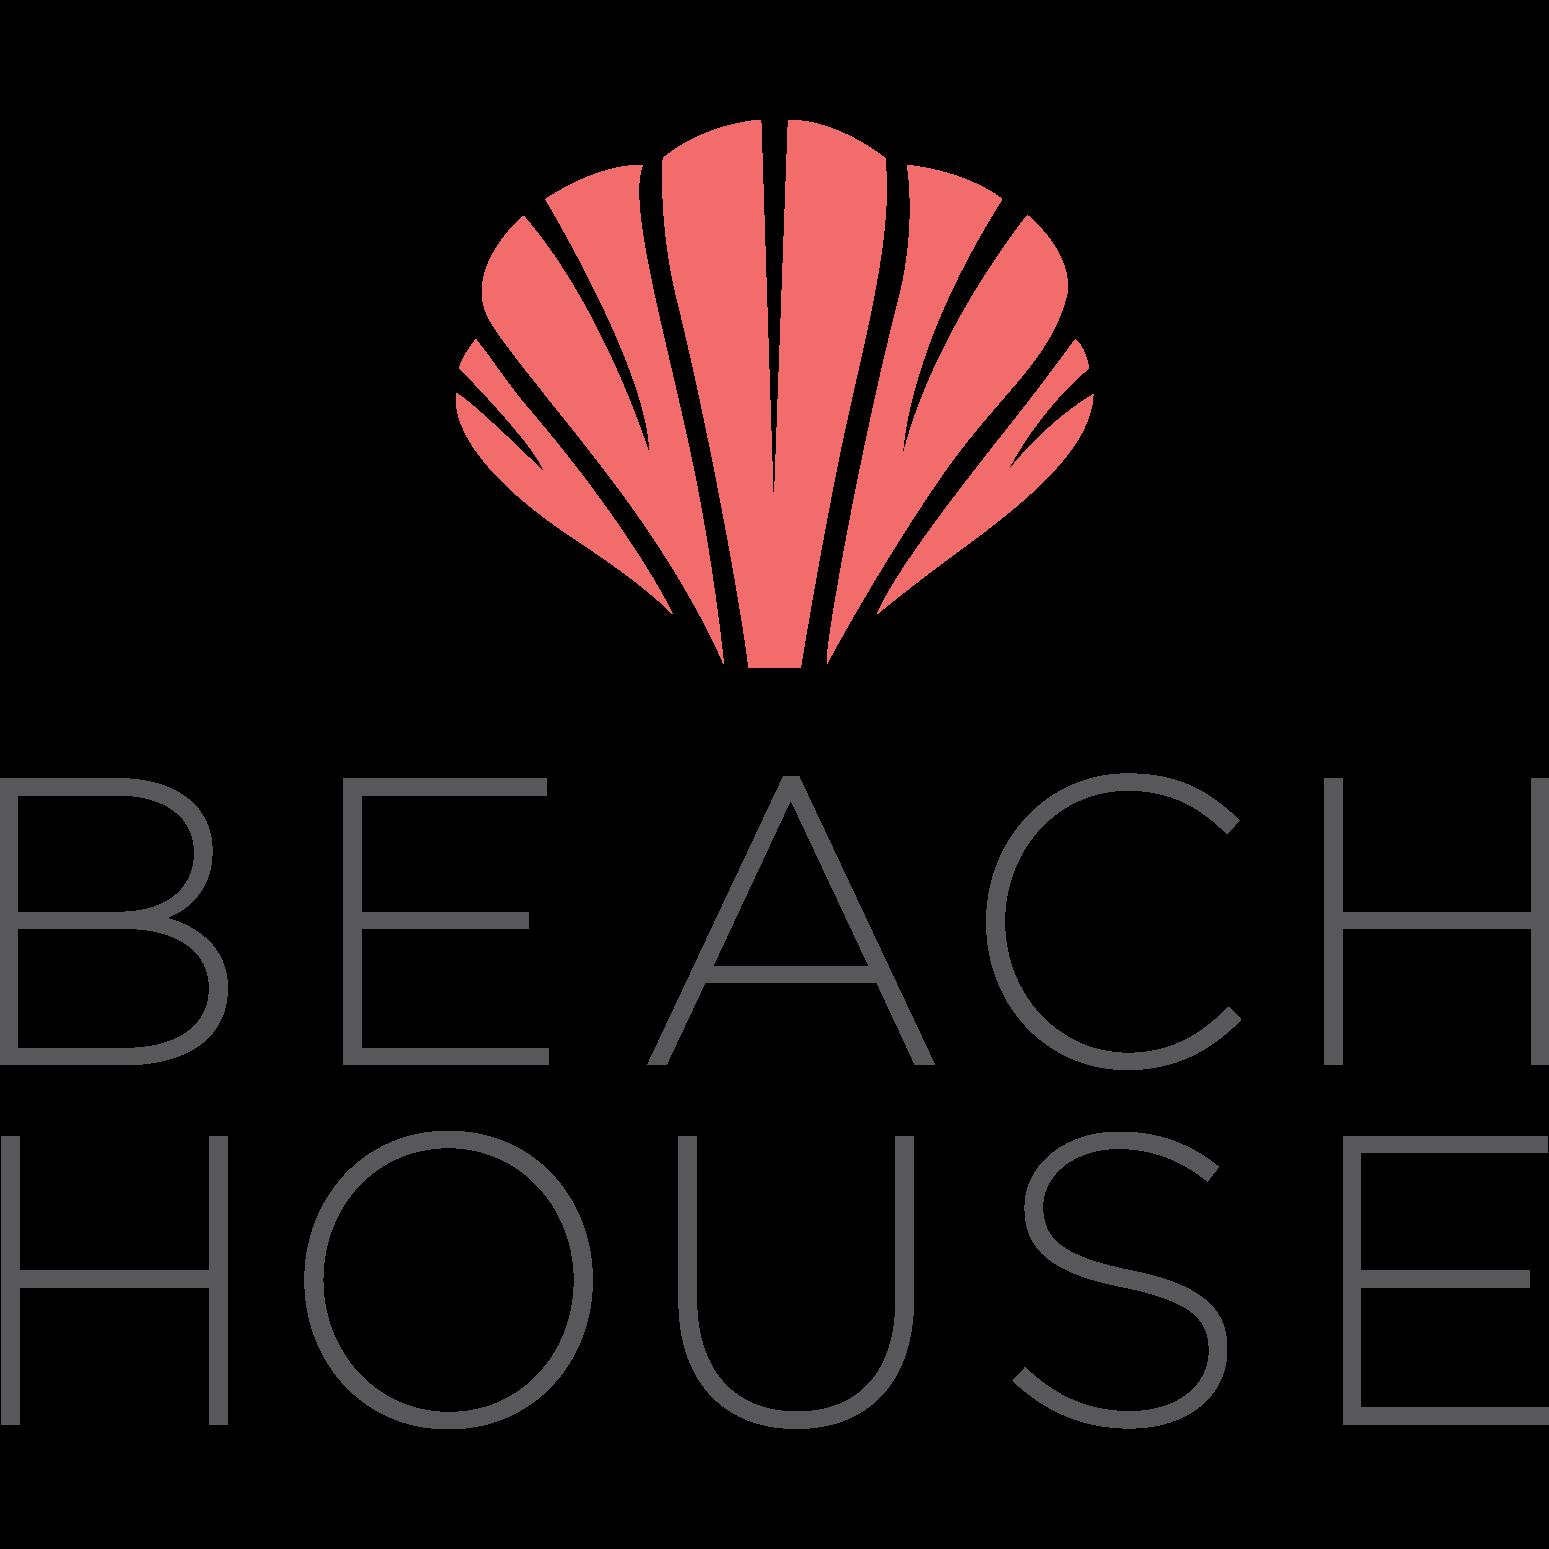 Apartment Rental Agency in MA Revere 02151 Beach House 540 Revere Beach Boulevard  (781)286-5600